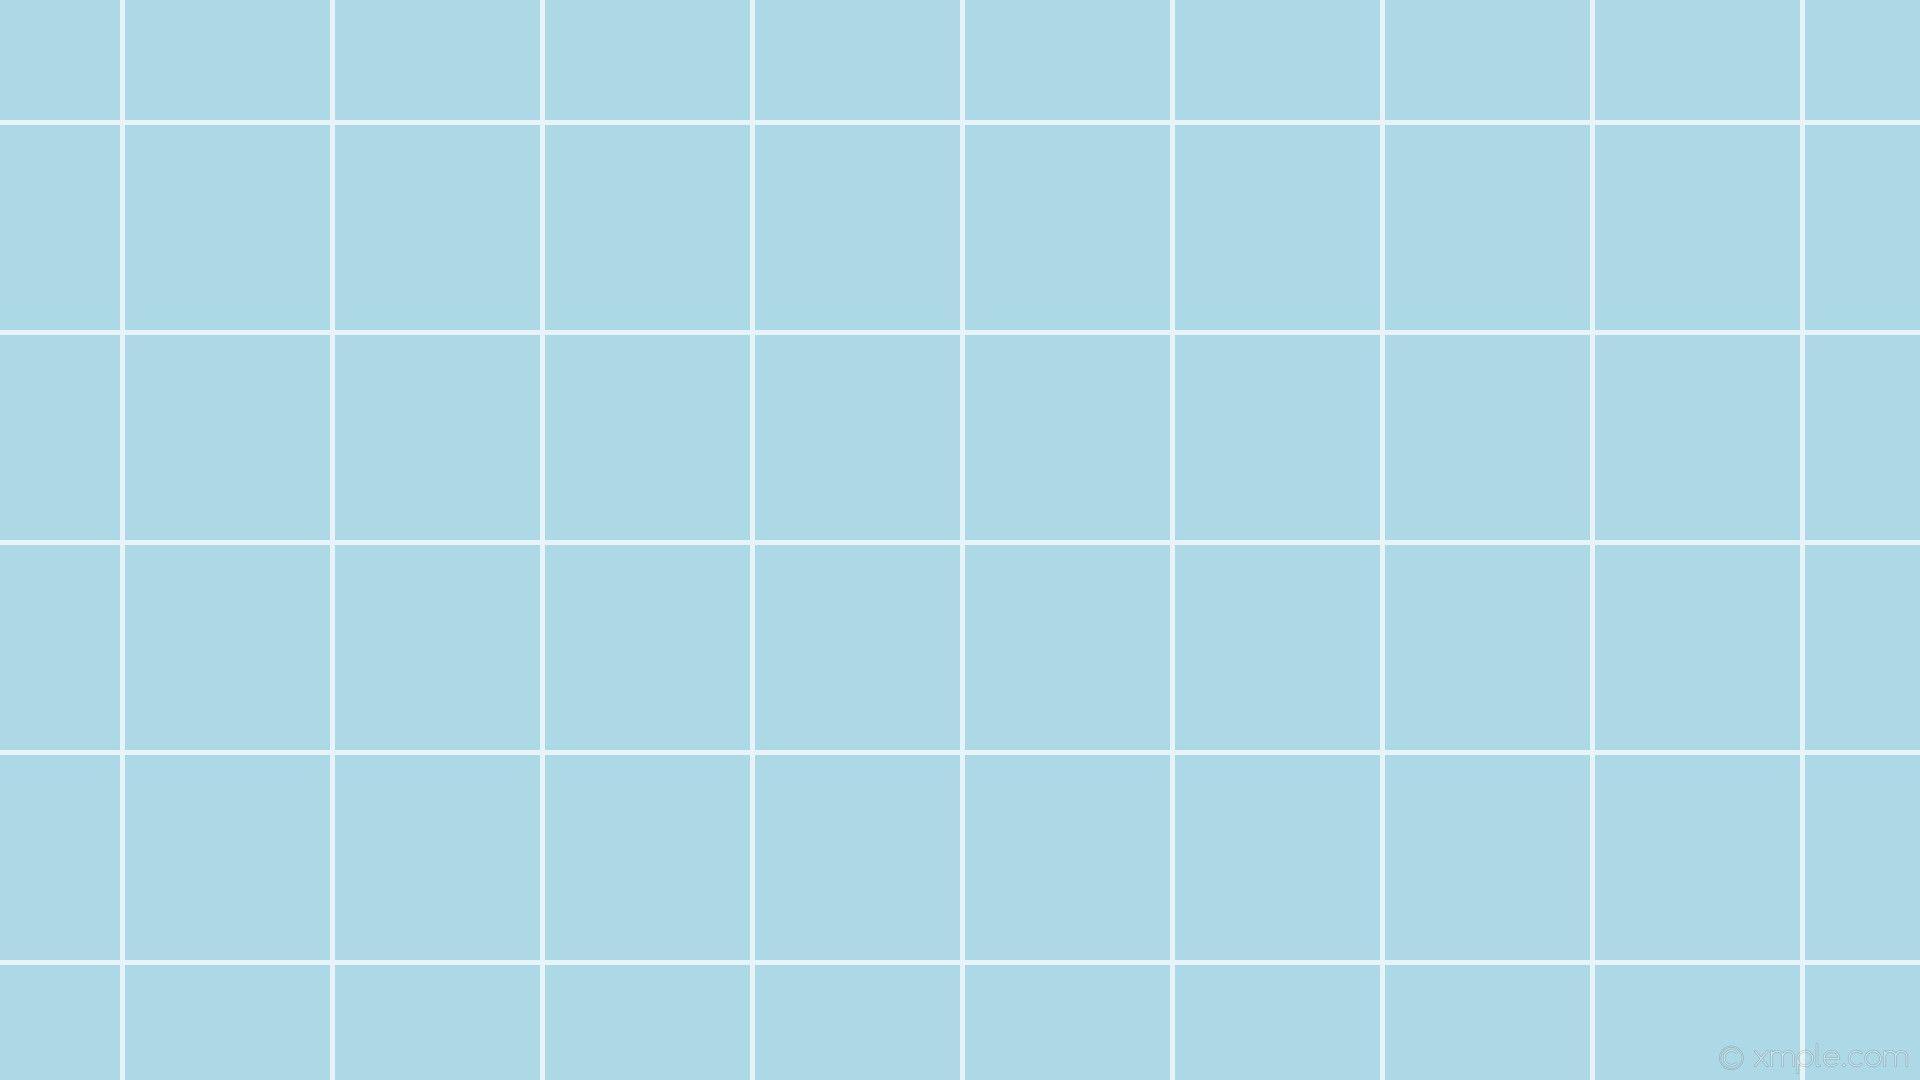 Blue Aesthetic Desktop Wallpapers Wallpaper Cave